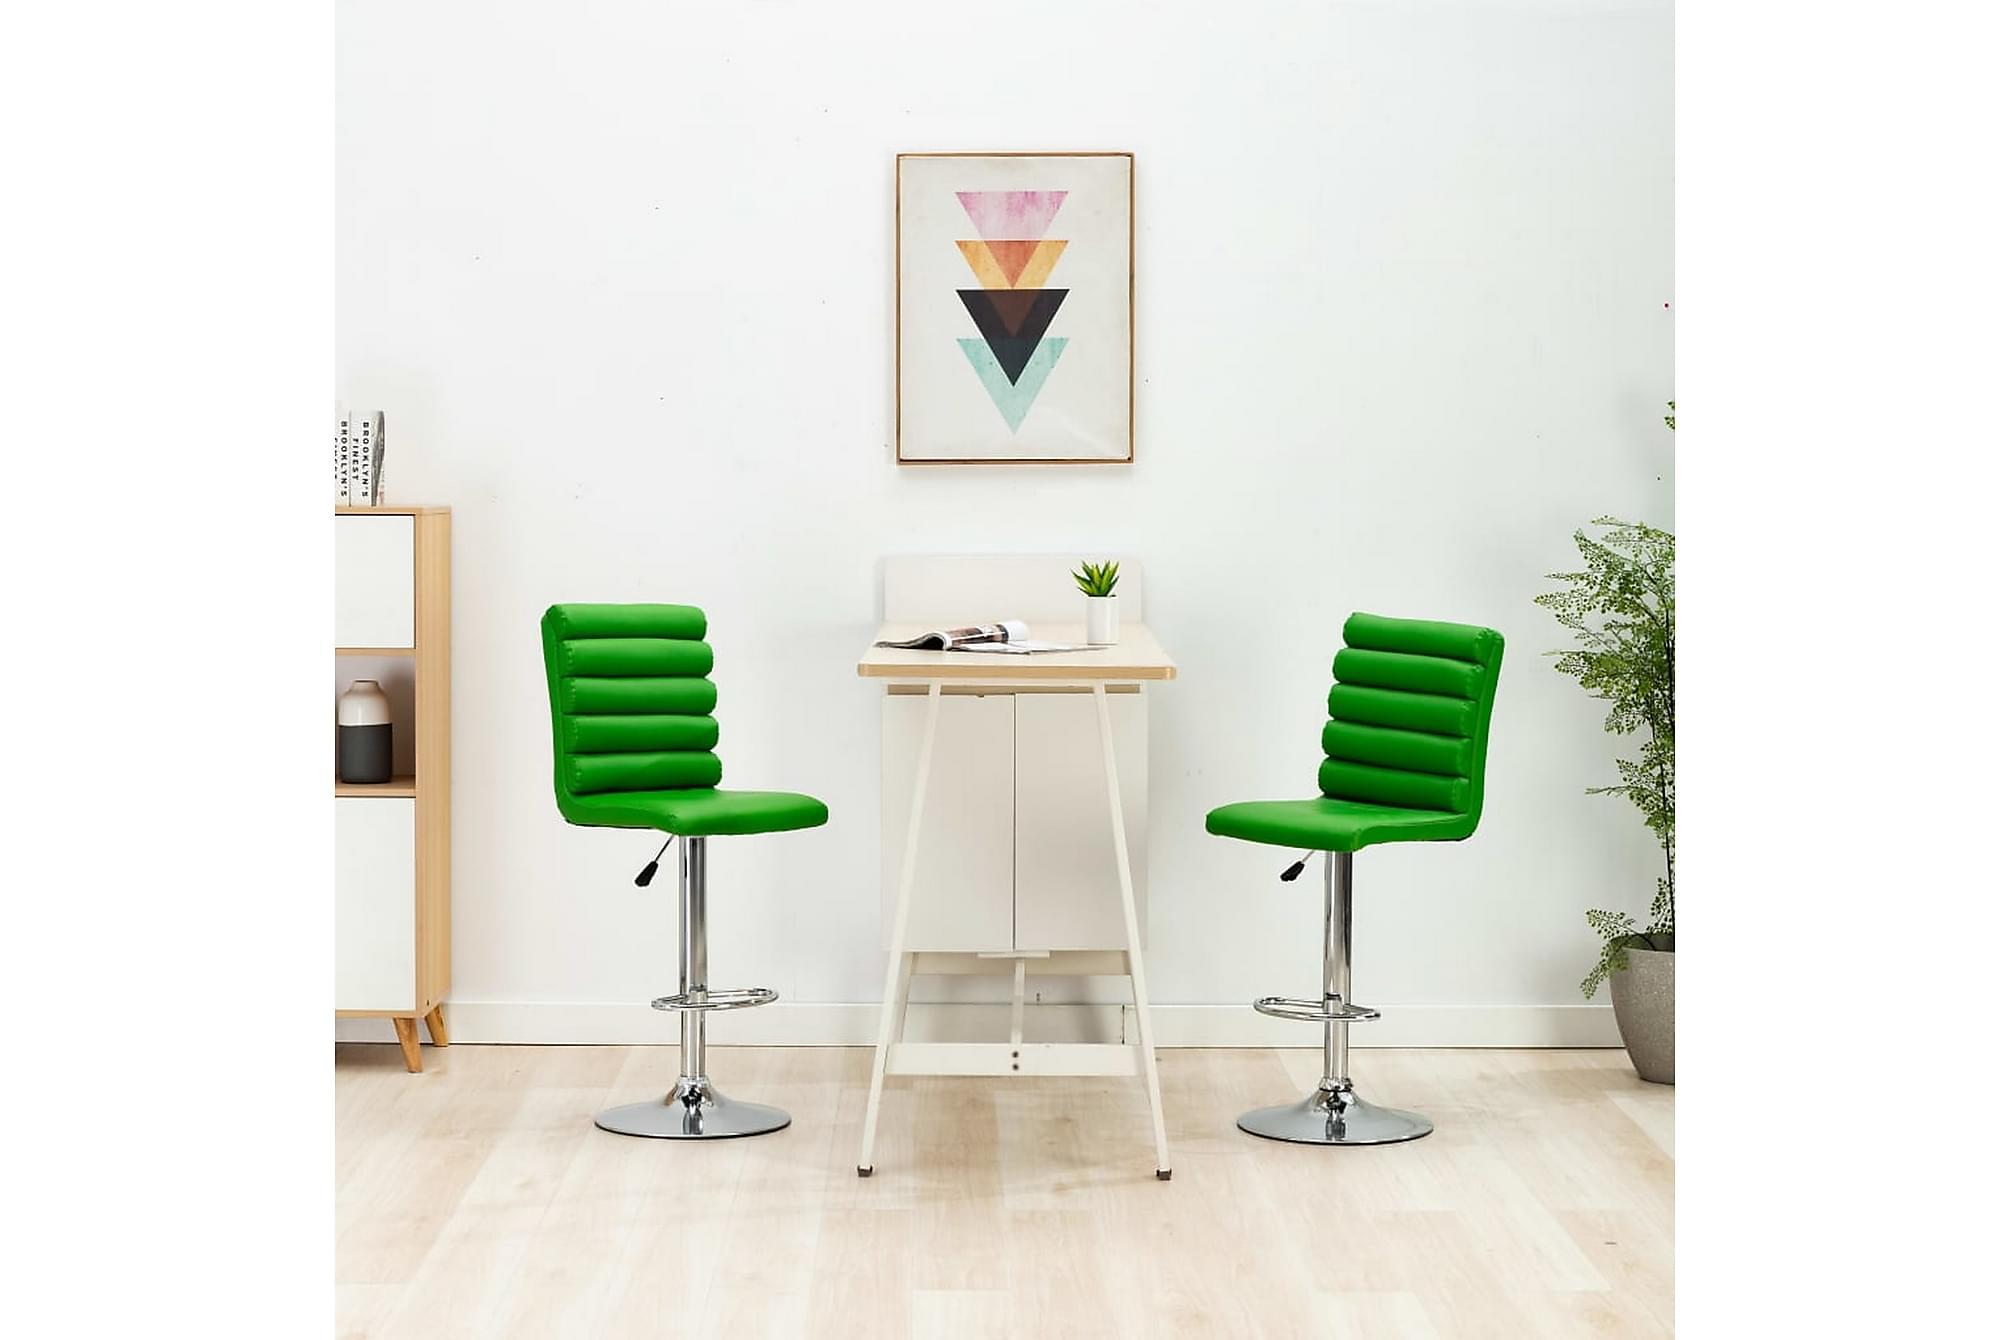 Barstol grön konstläder